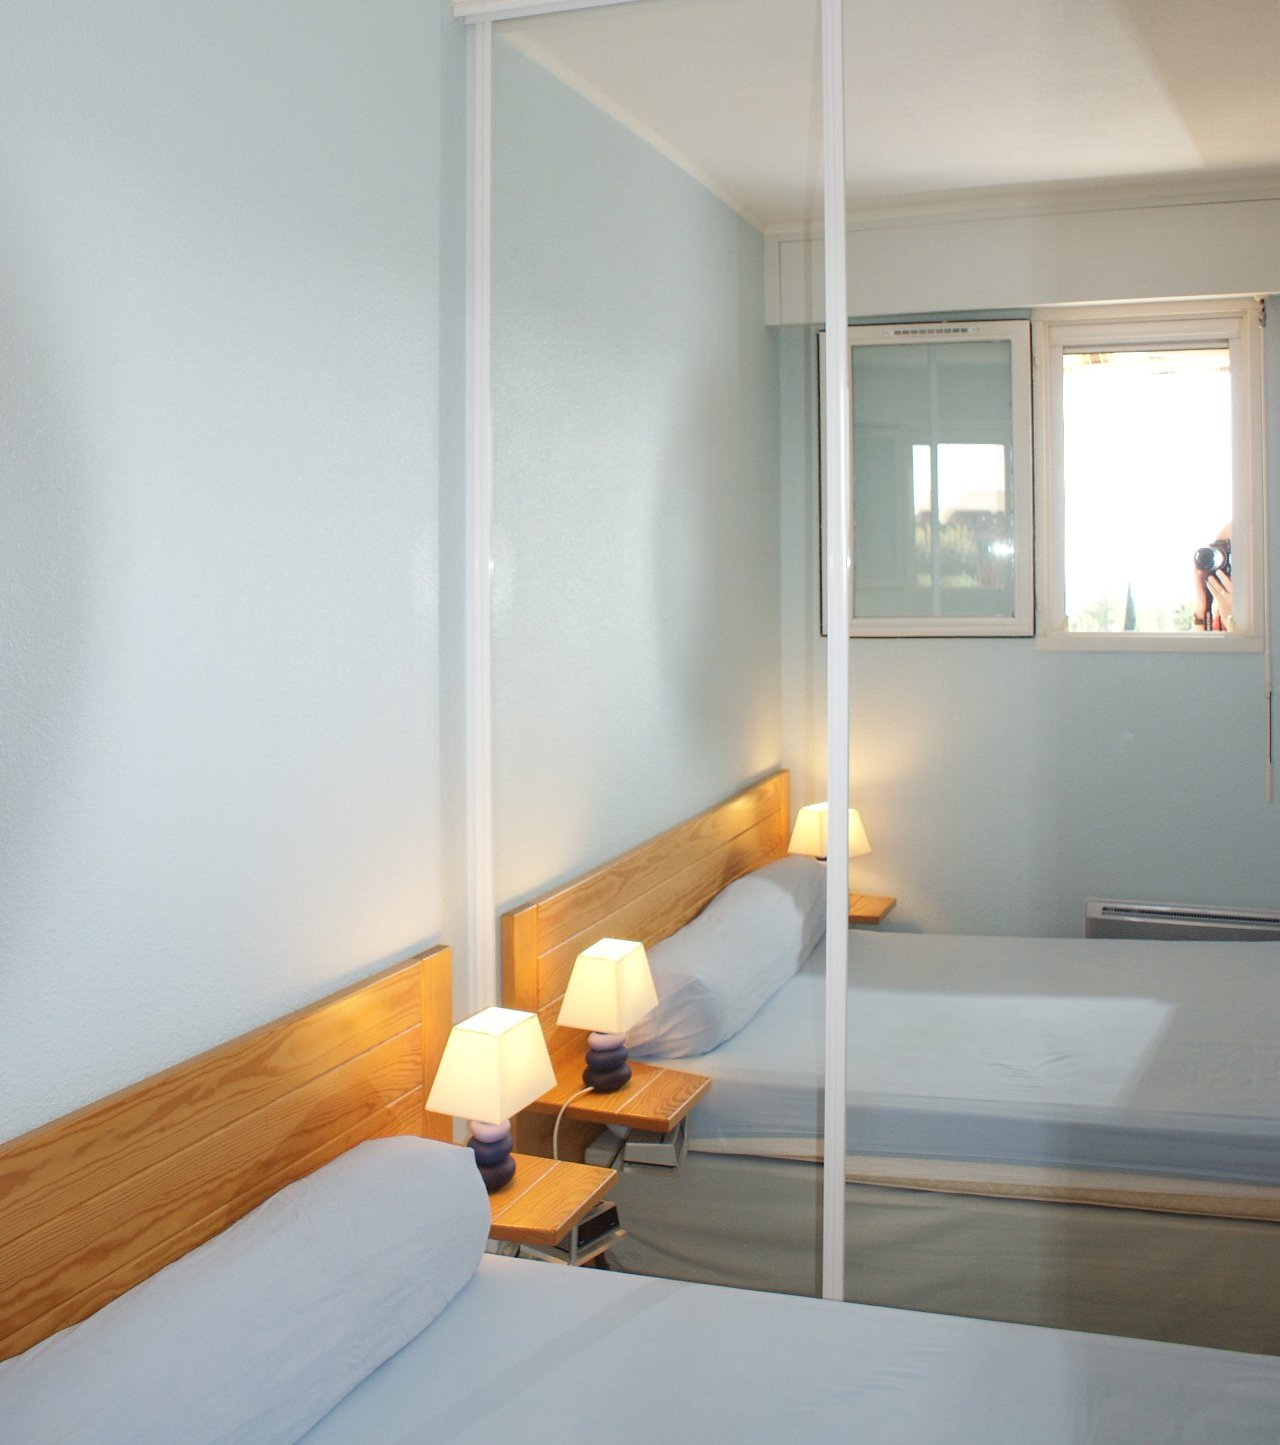 2 Zimmer mit Meerblick in tadellosem Zustand